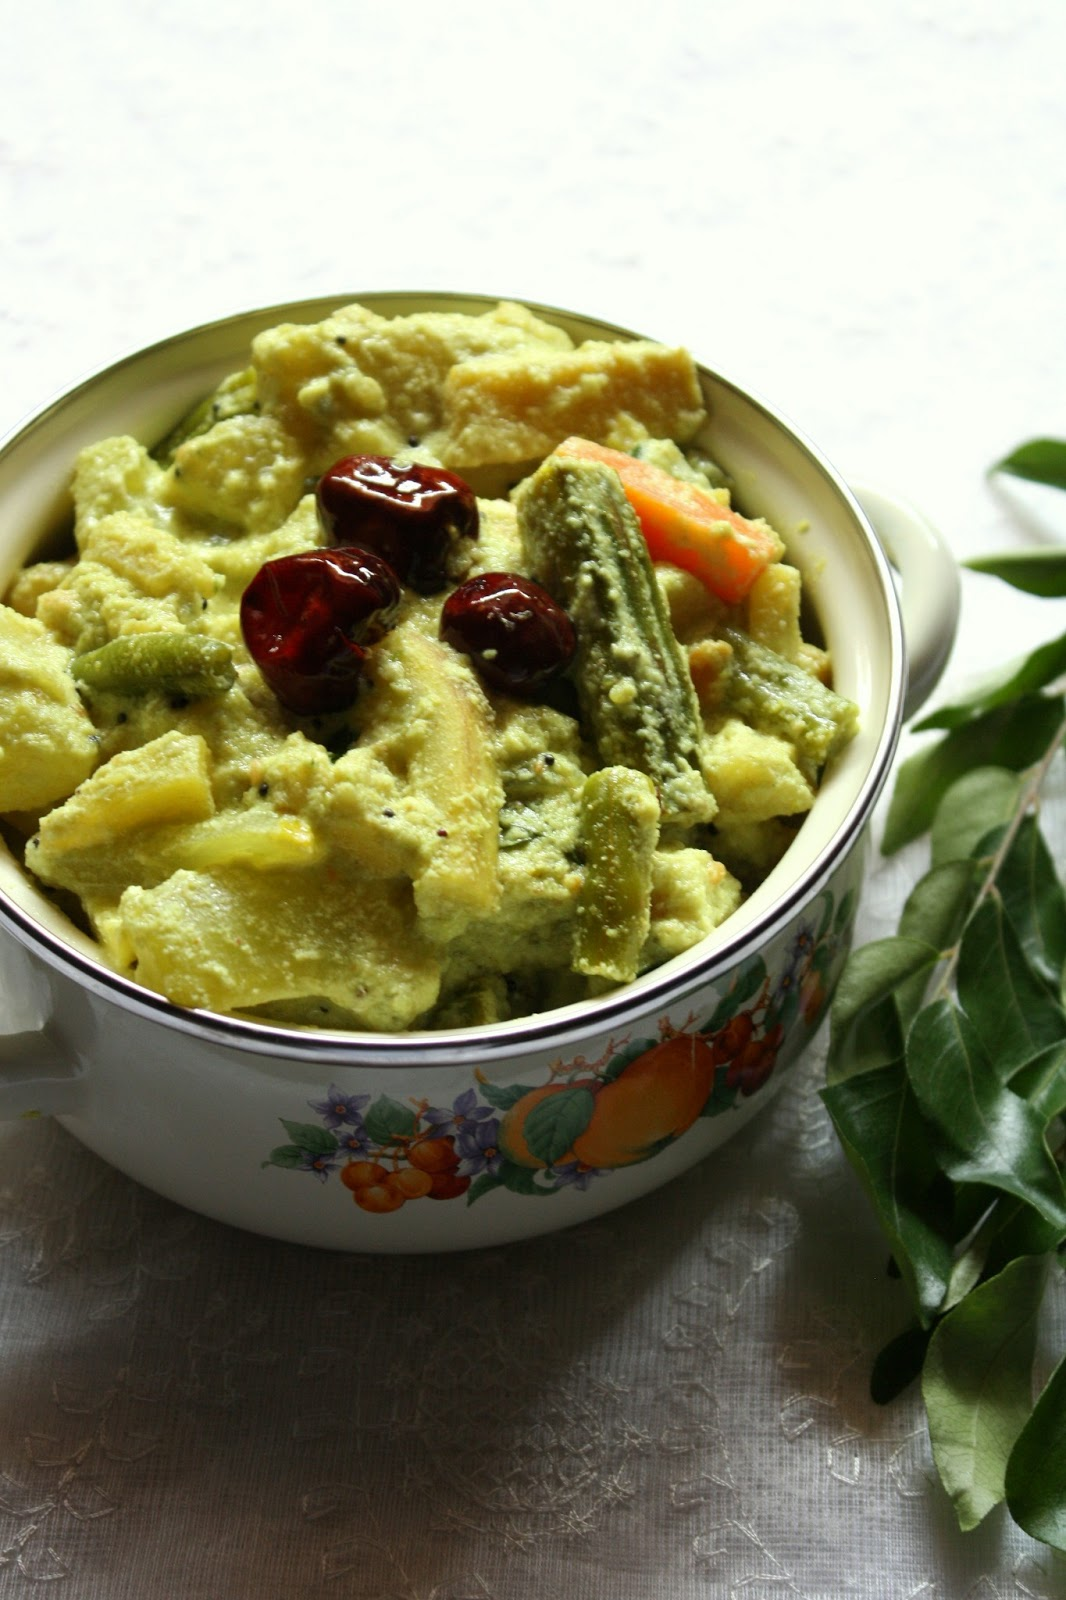 Cook like priya kerala style aviyal recipe mixed vegetable kerala style aviyal recipe mixed vegetable coconut curry kerala vegetarian curry forumfinder Gallery